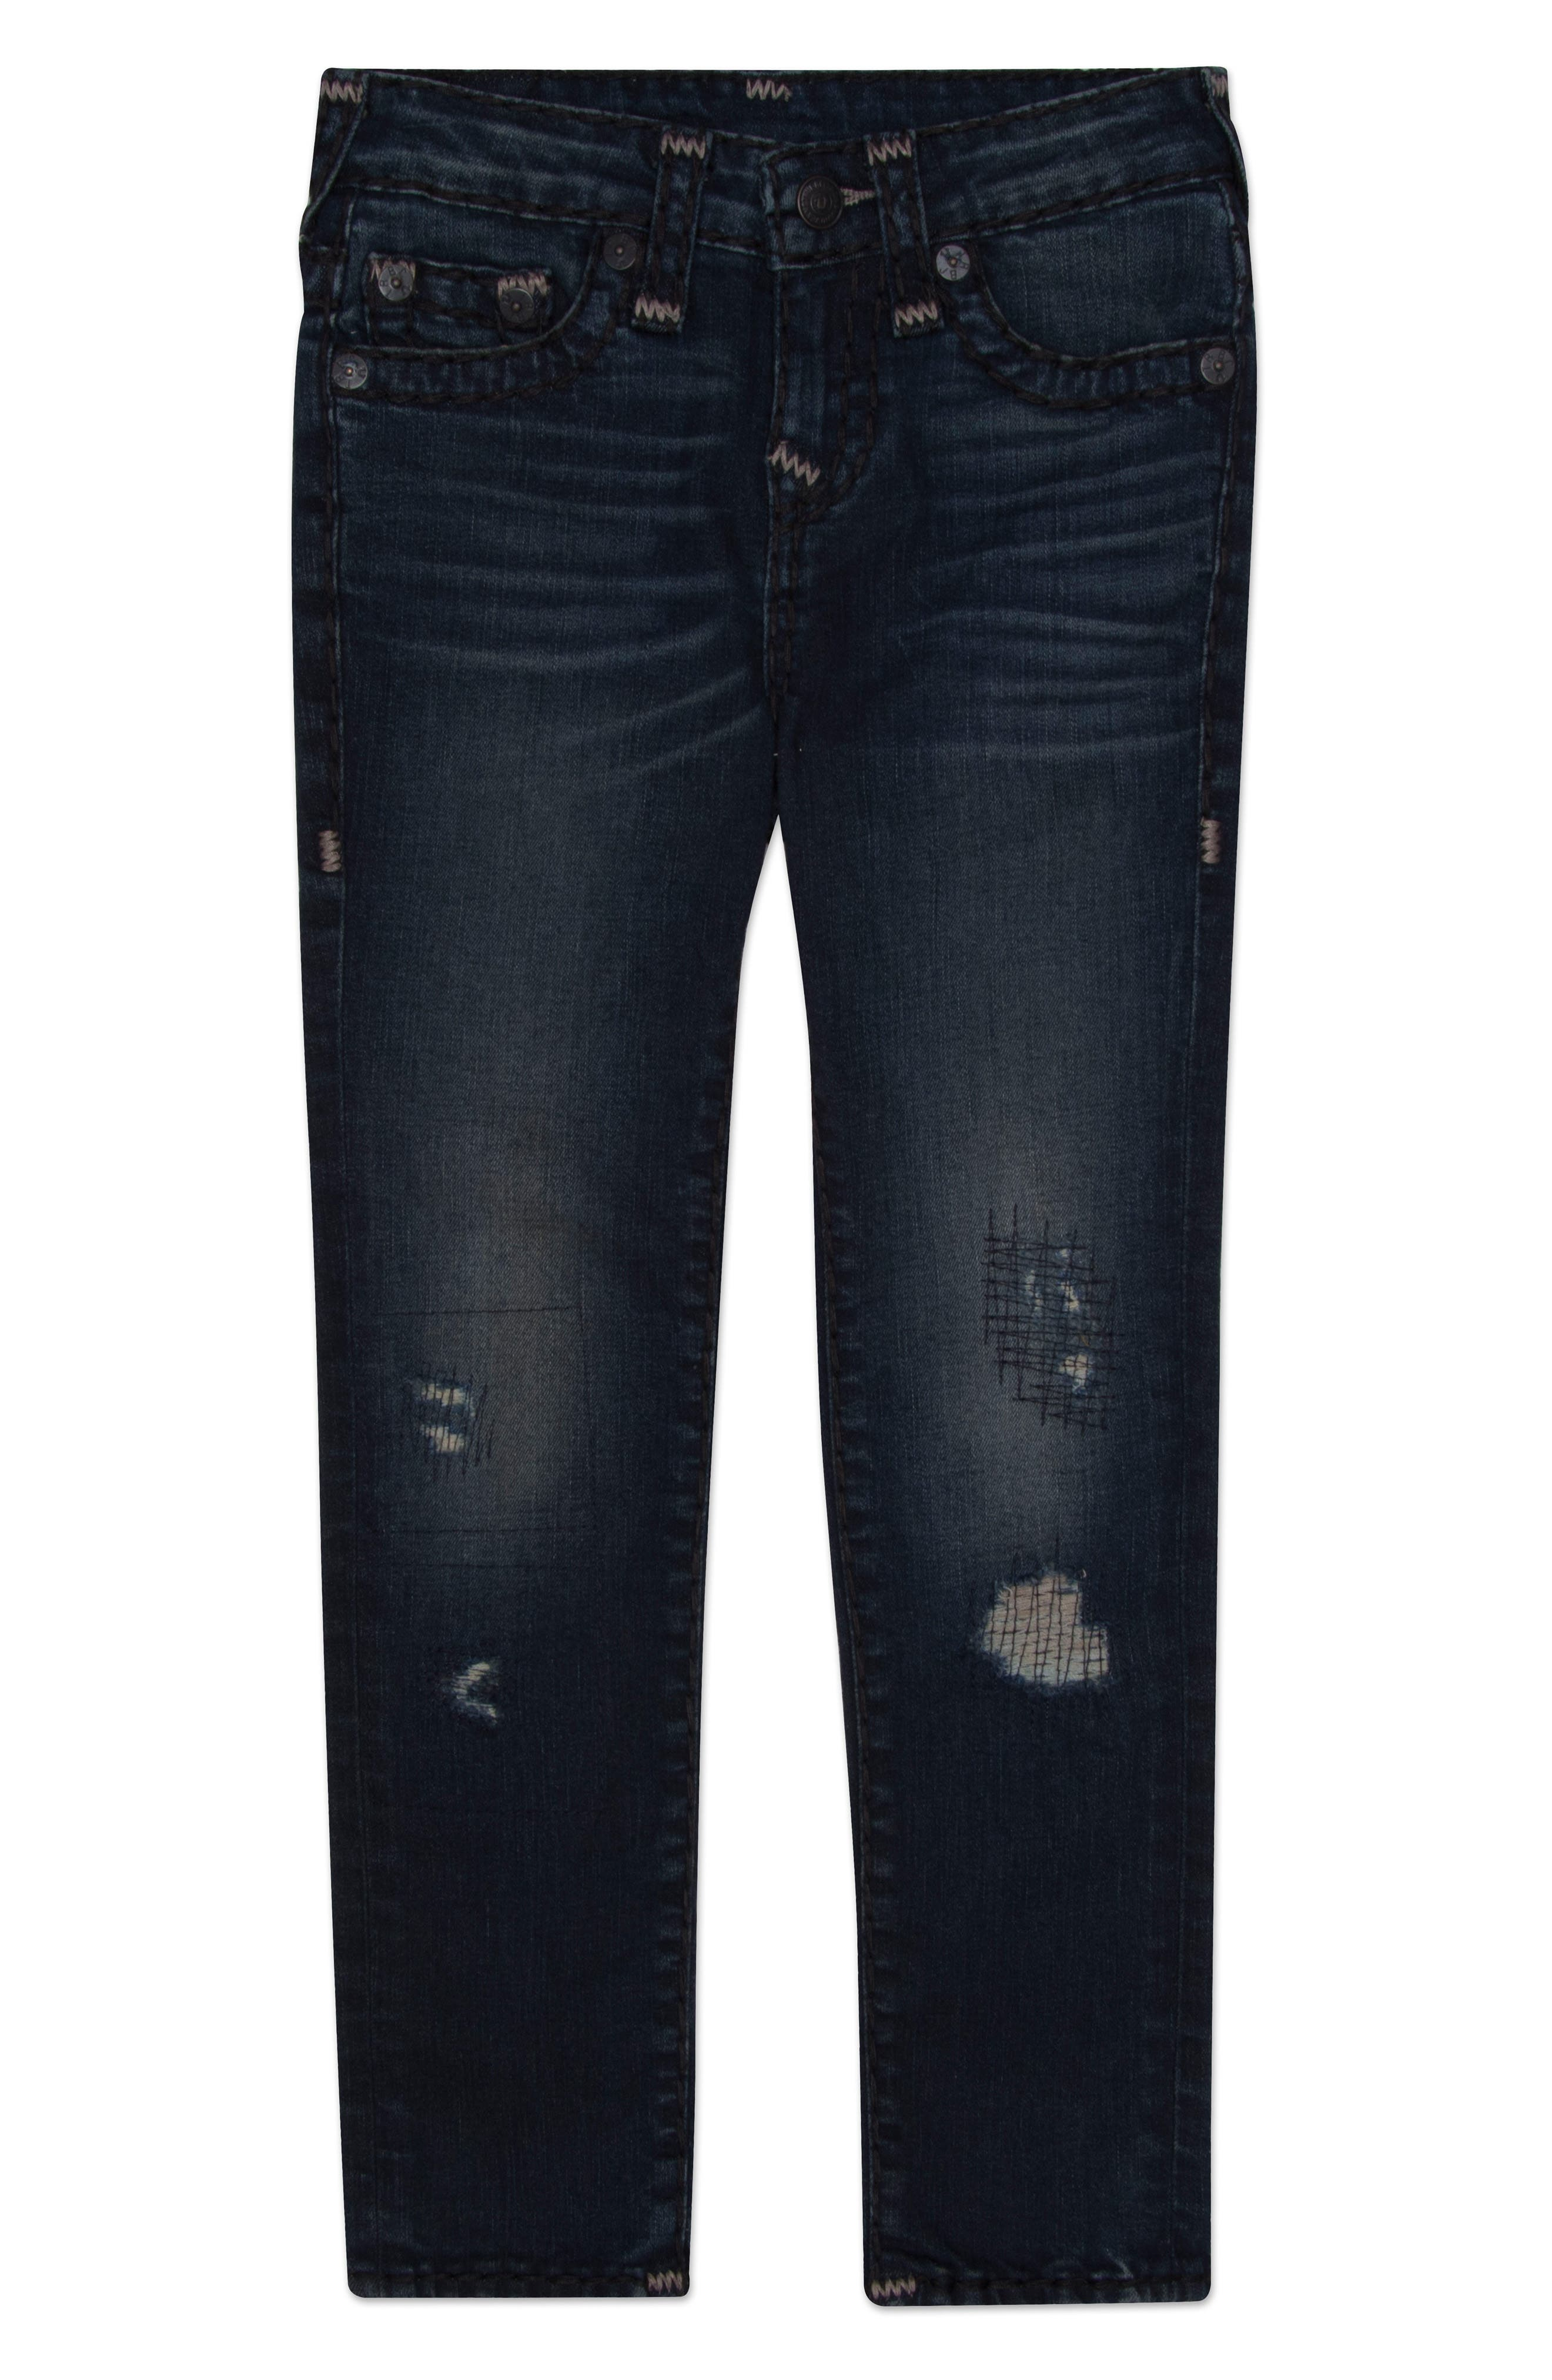 Main Image - True Religion Brand Jeans Geno Super T Jeans (Toddler Boys, Little Boys & Big Boys)